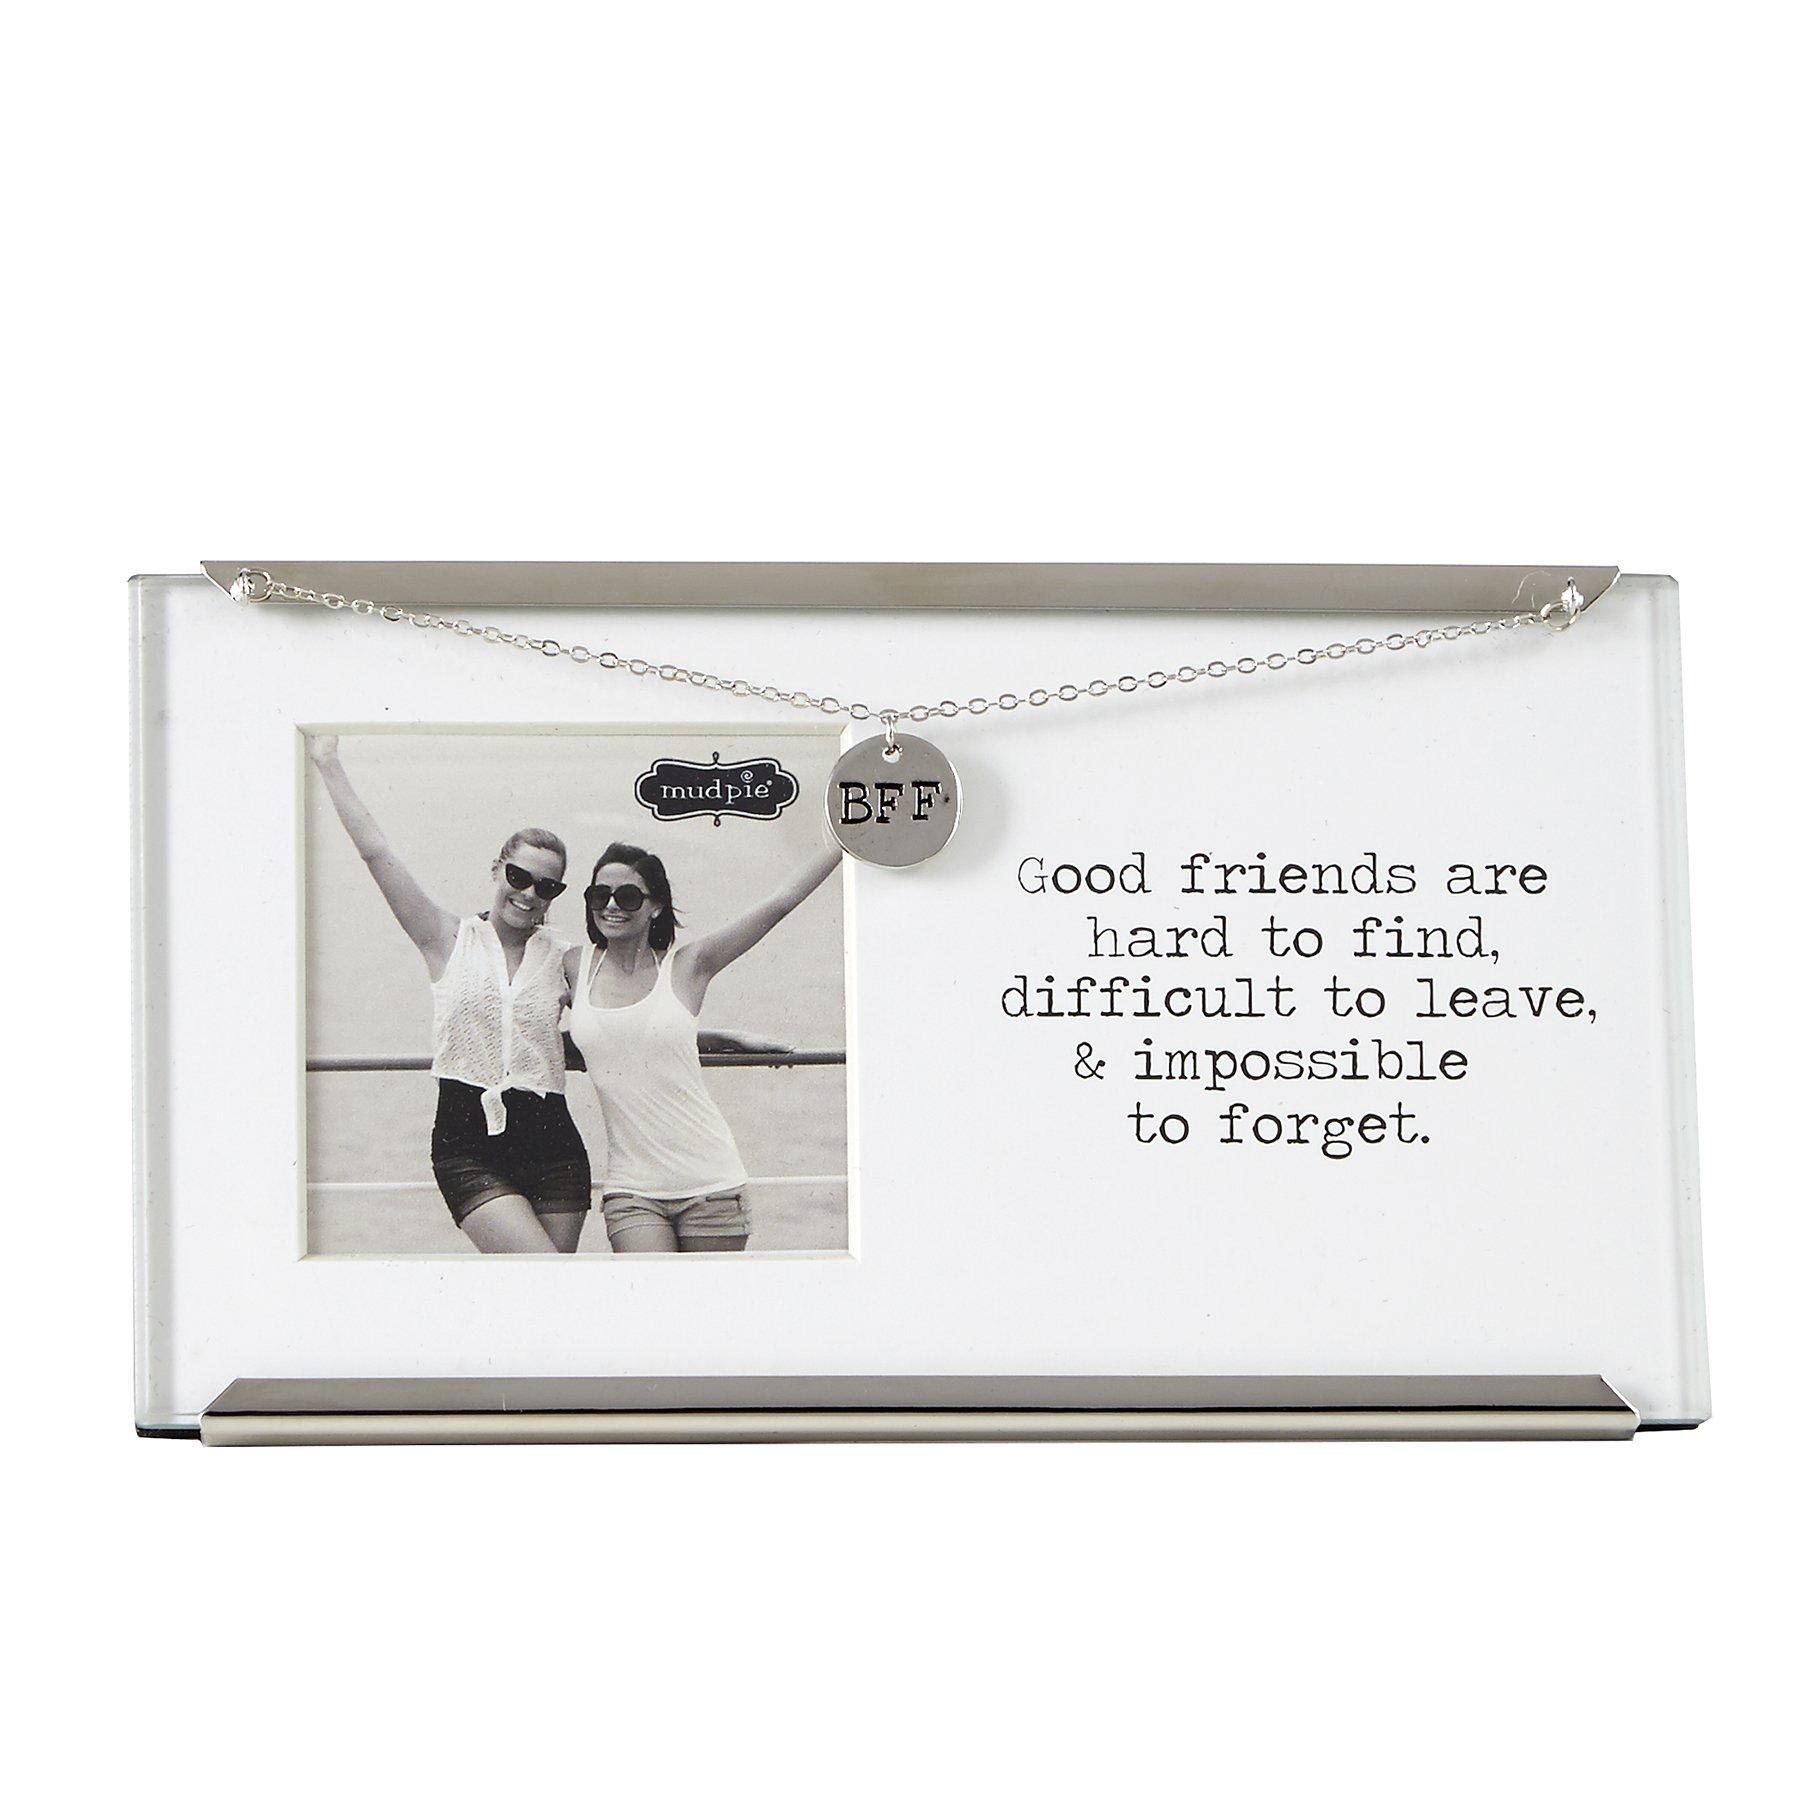 Mud Pie Glass Friend Clip Frame, 2.5 x 2.5''